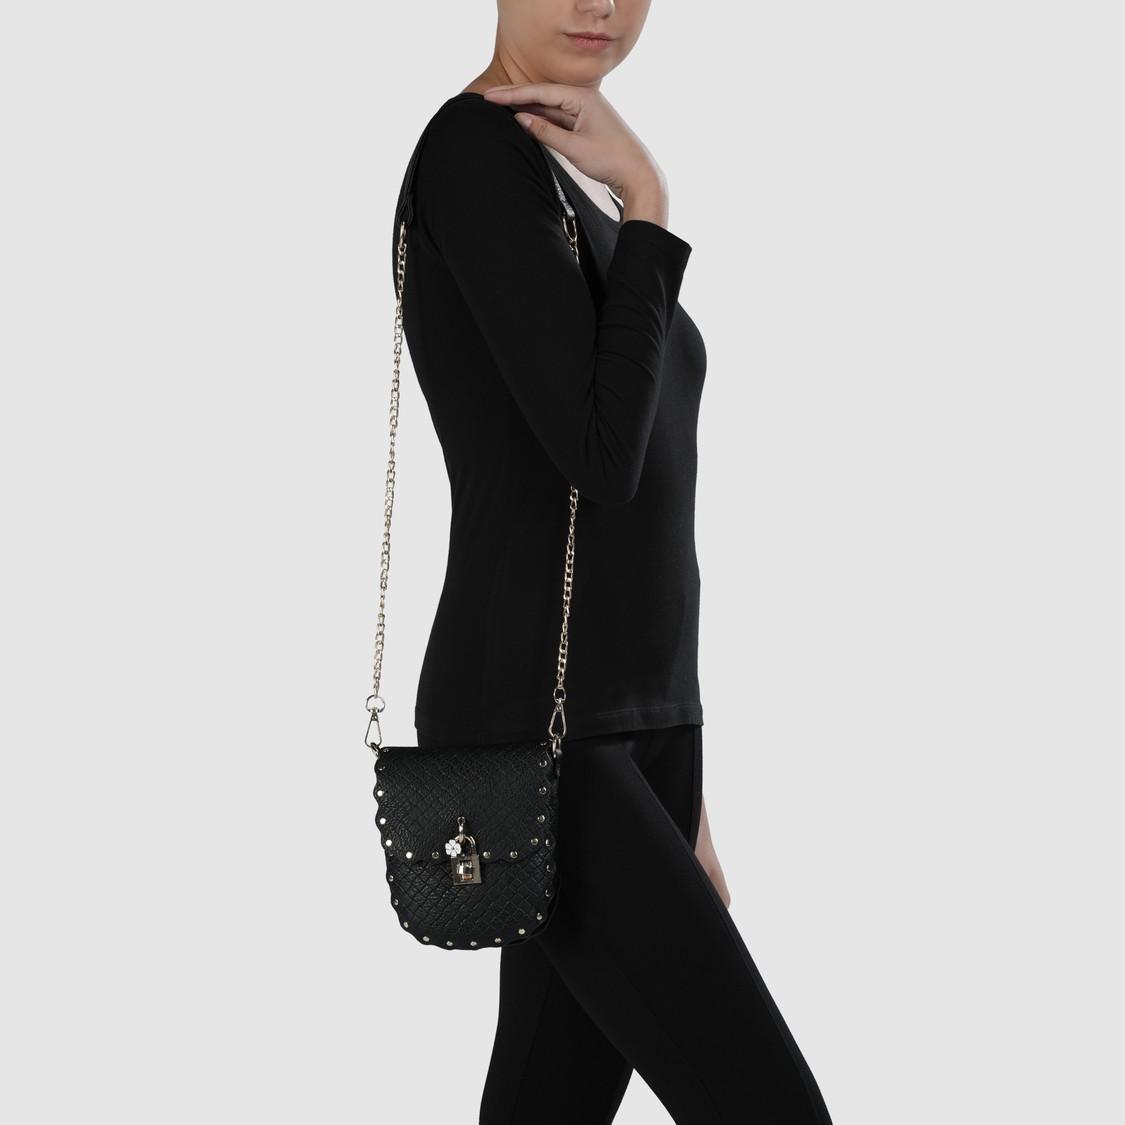 Textured Handbag with Flap